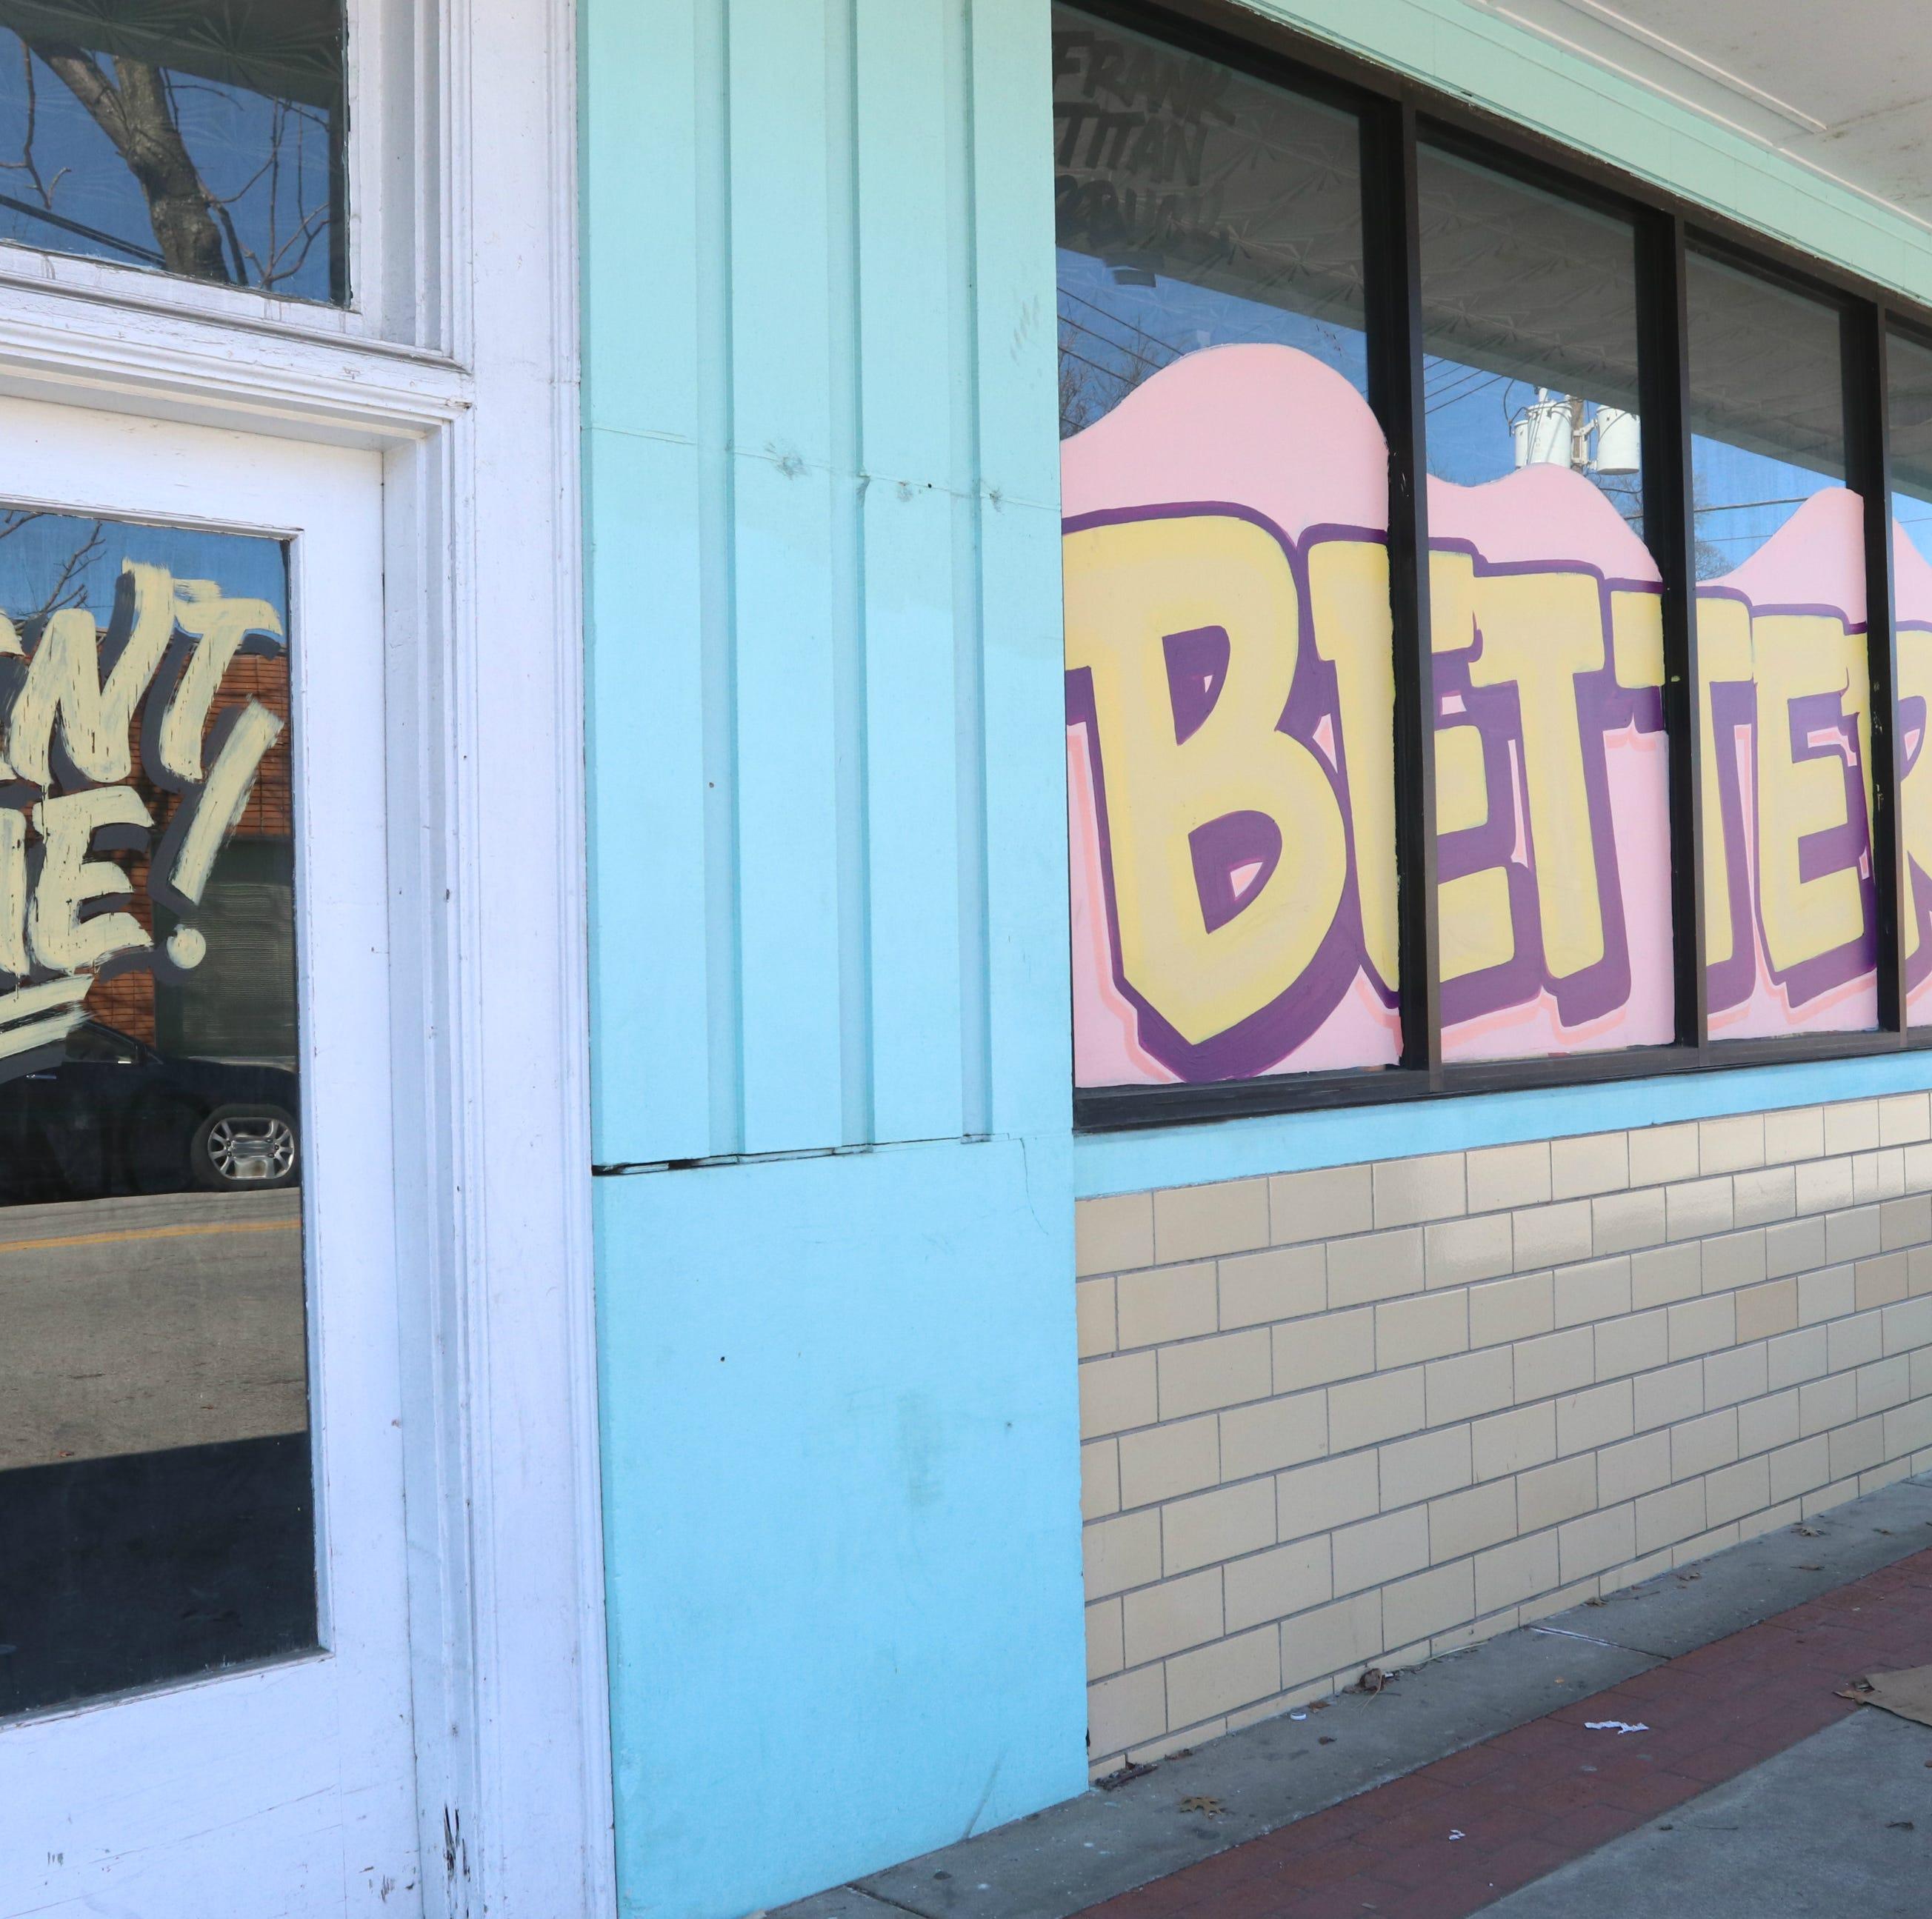 How design plans could help Louisville neighborhoods avoid gentrification